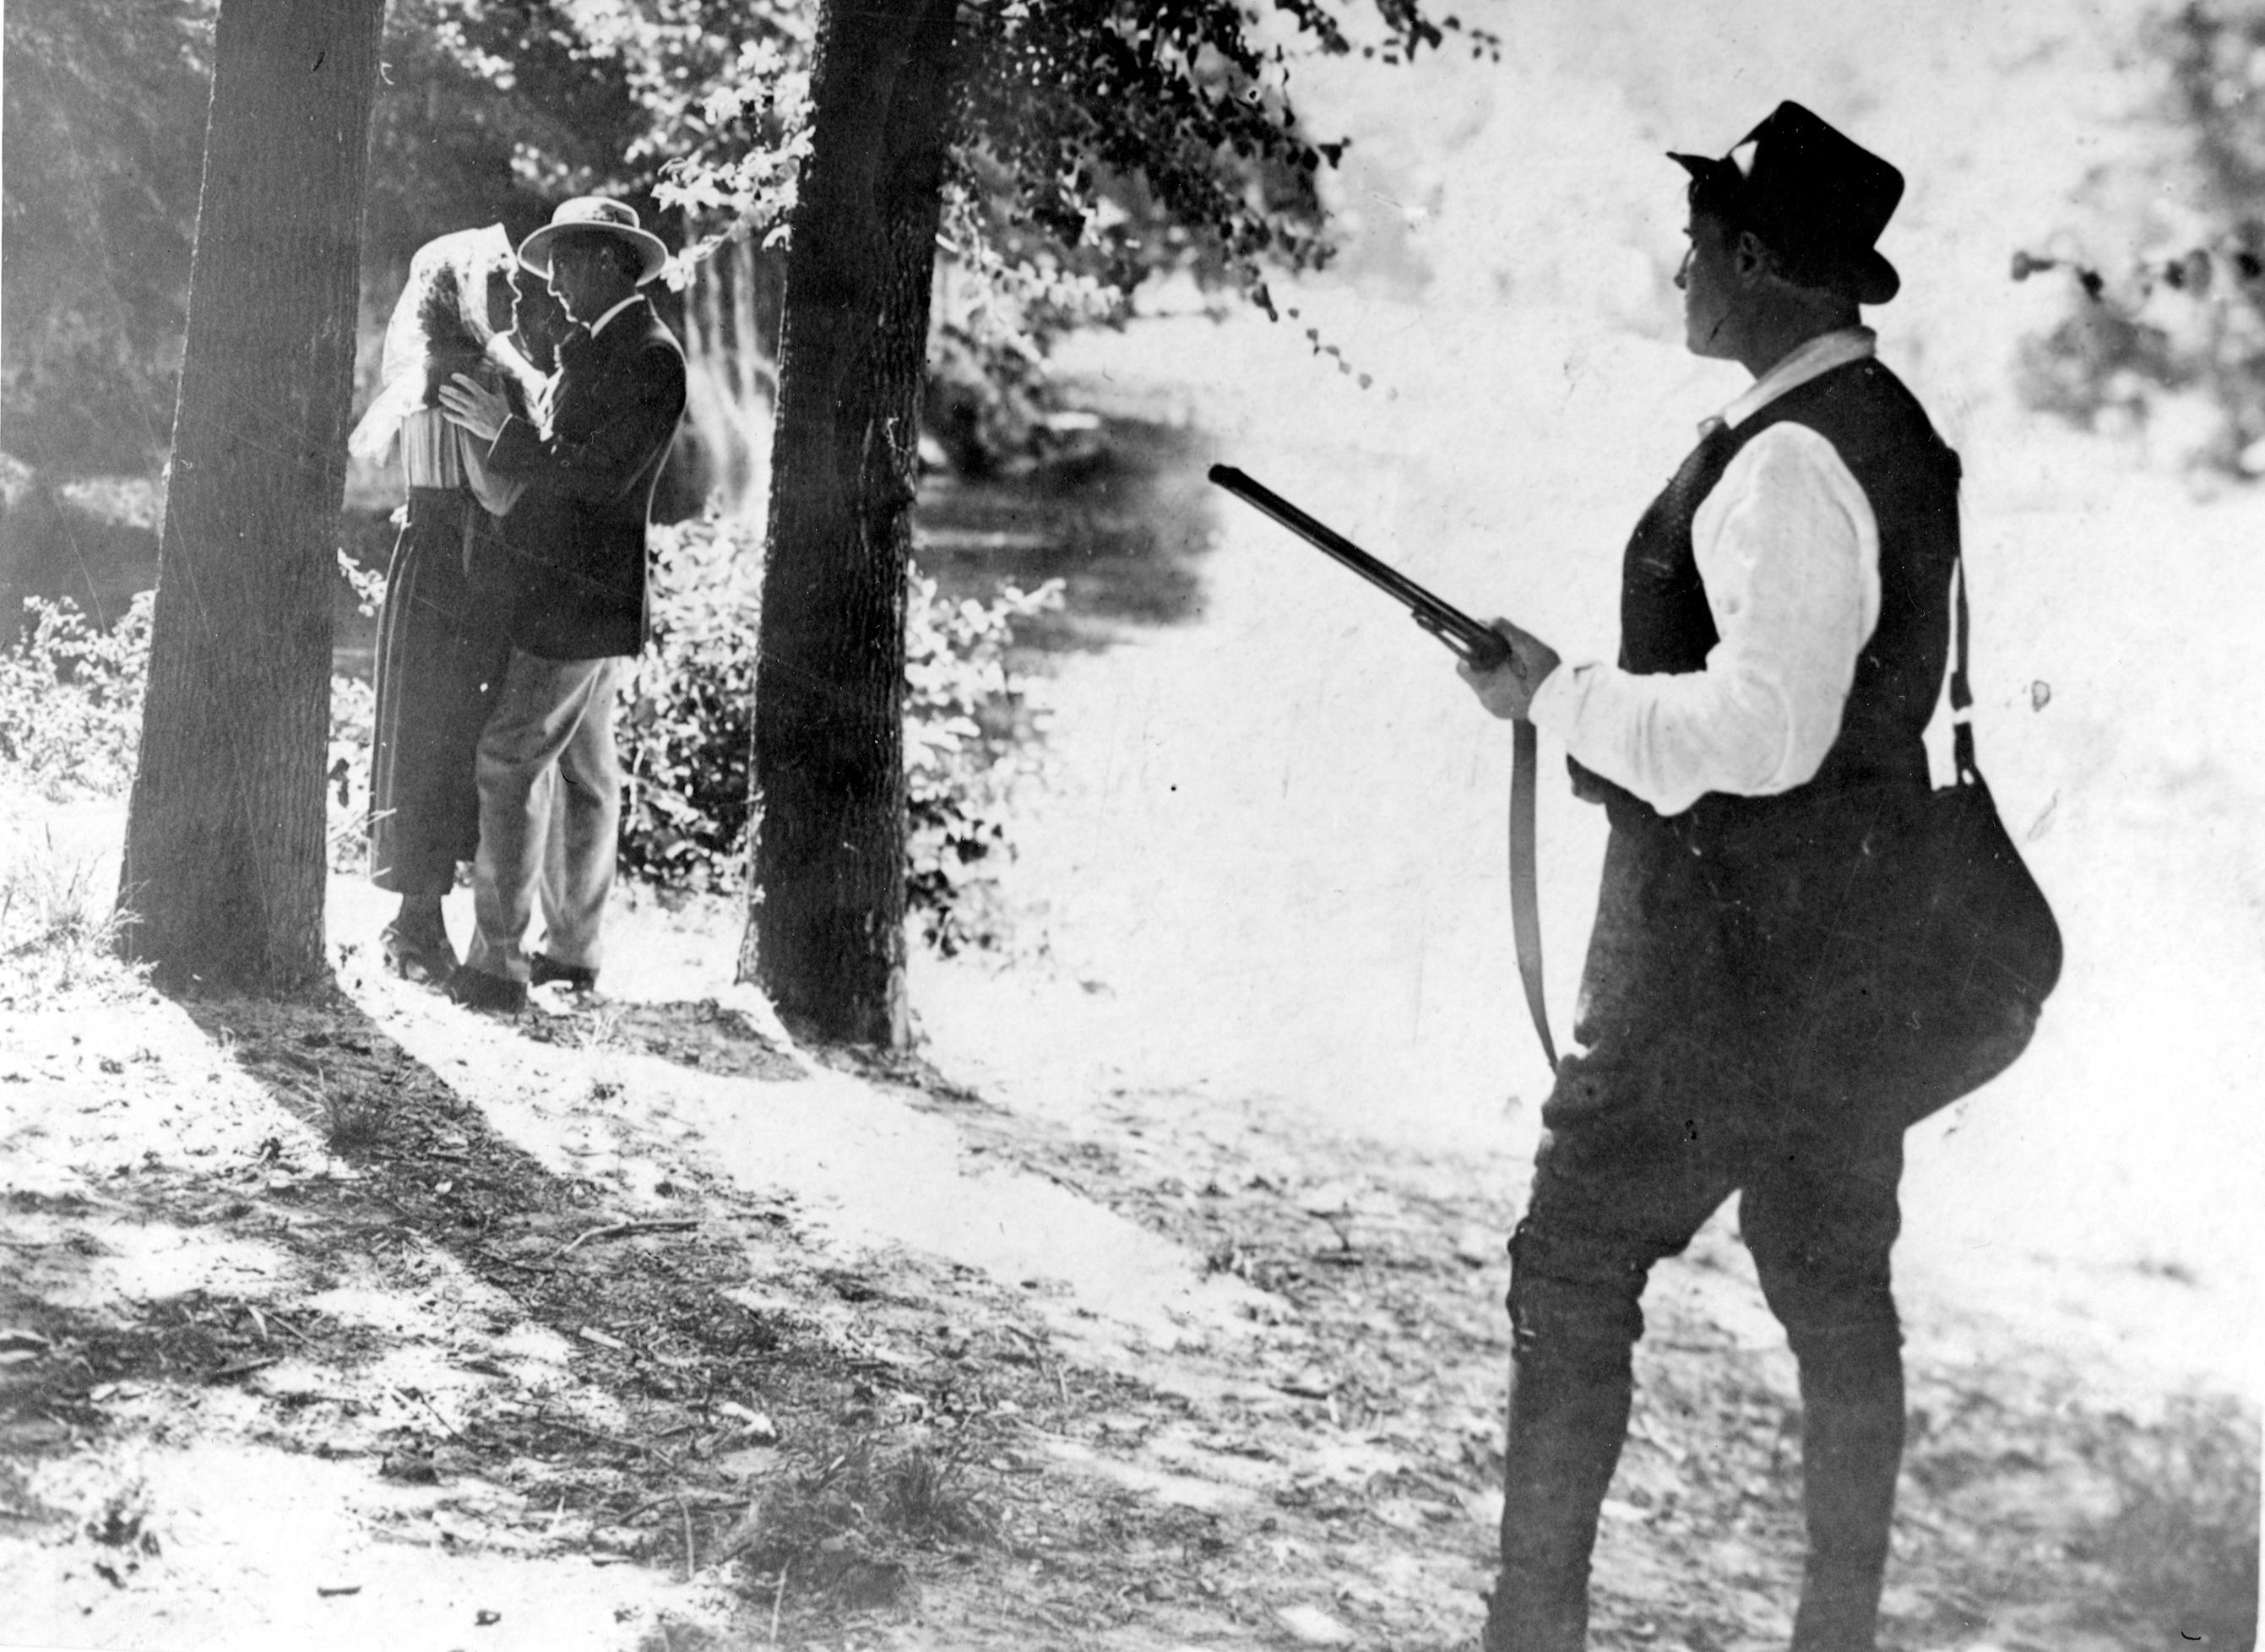 Maryse Dauvray, Romuald Joubé, and Séverin-Mars in J'accuse (1919)